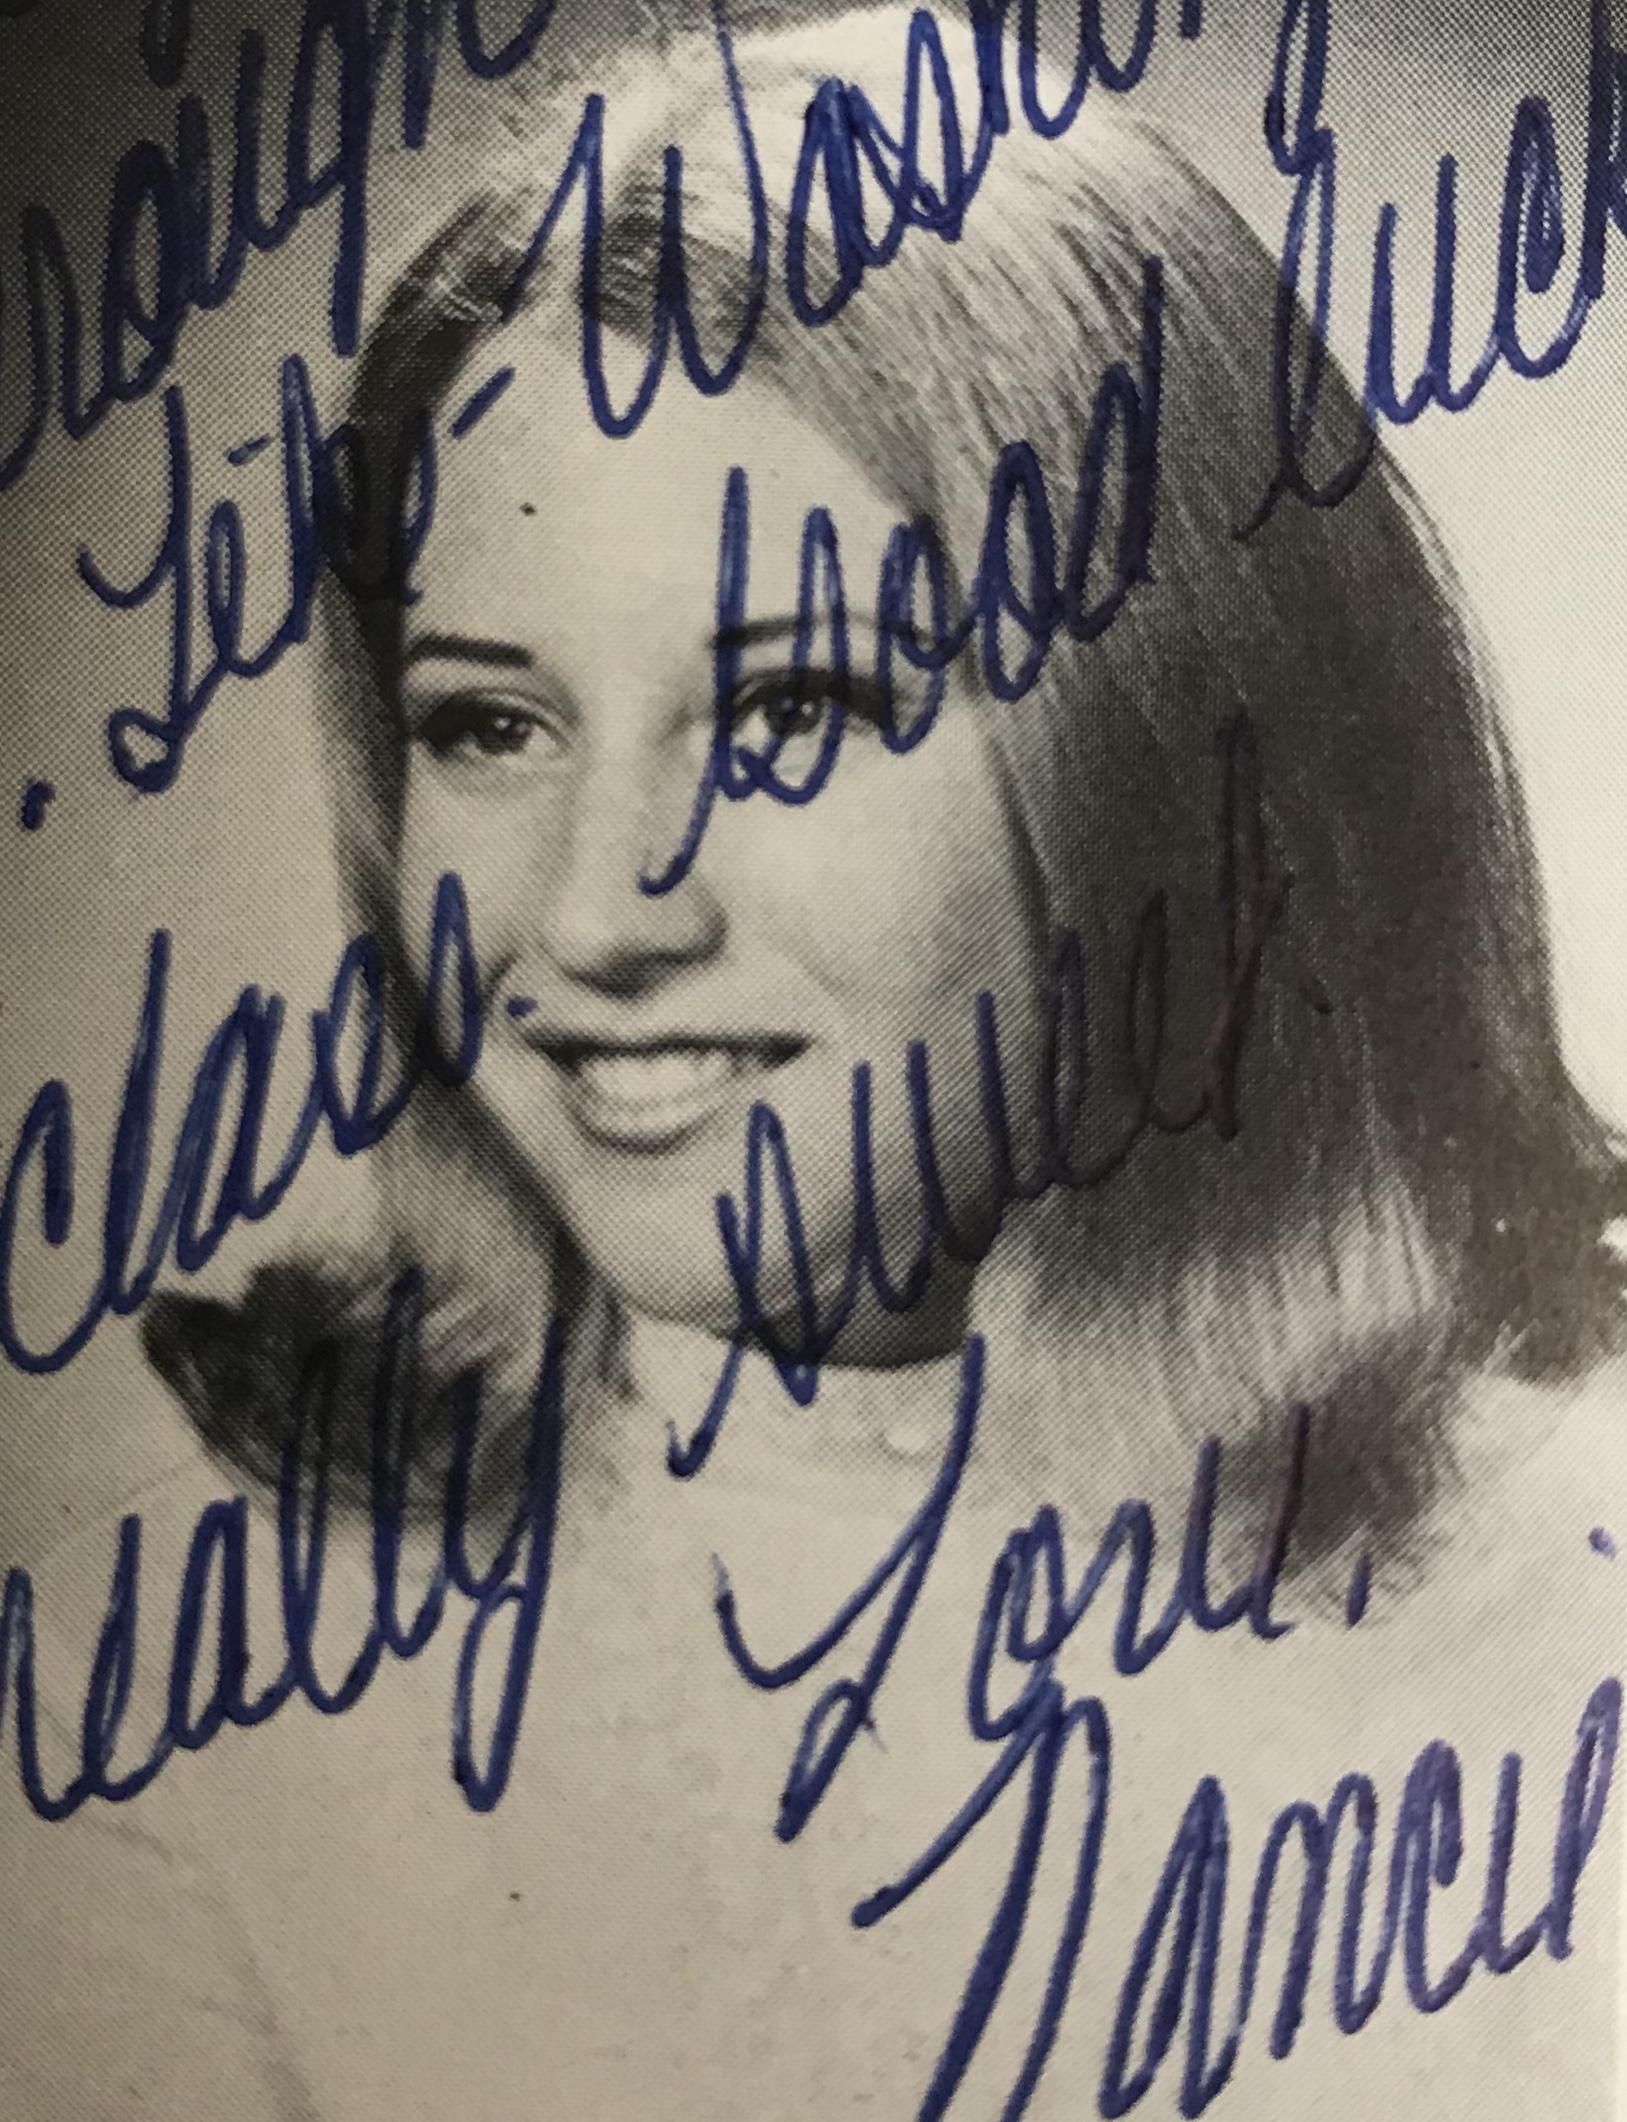 Nancy Hand Weingard